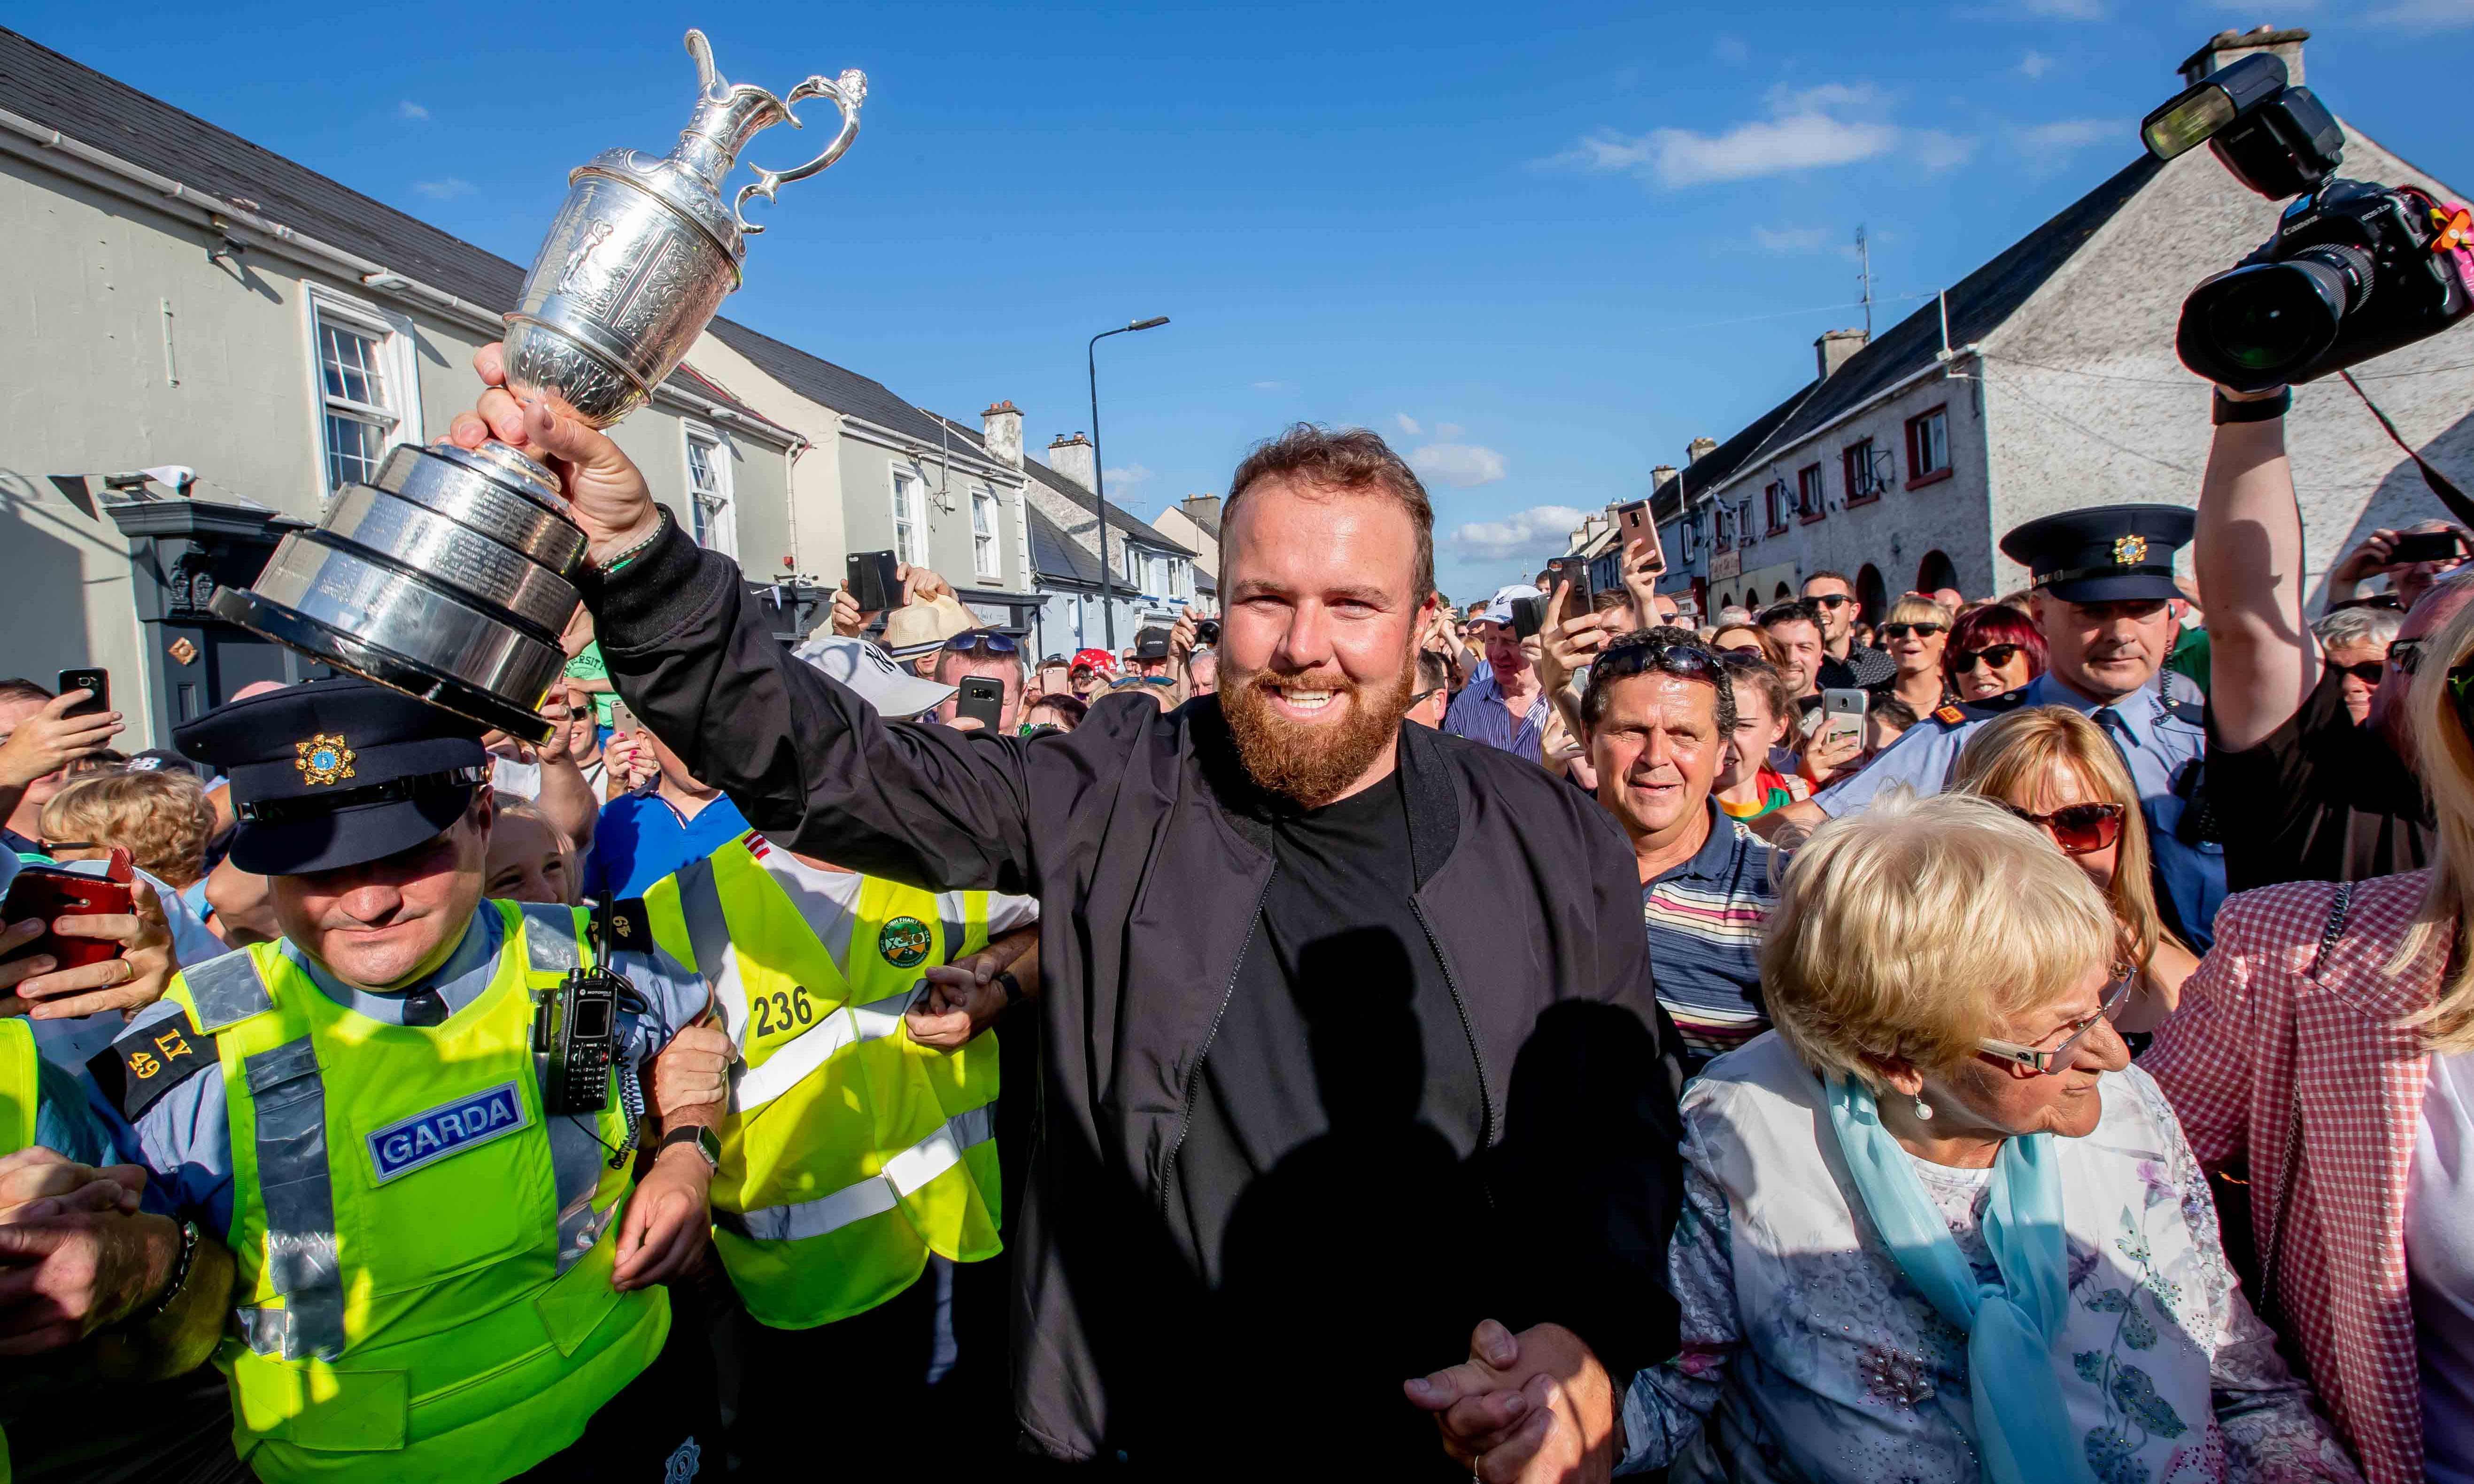 Open winner Shane Lowry warns rivals: 'I feel like I can beat anyone now'